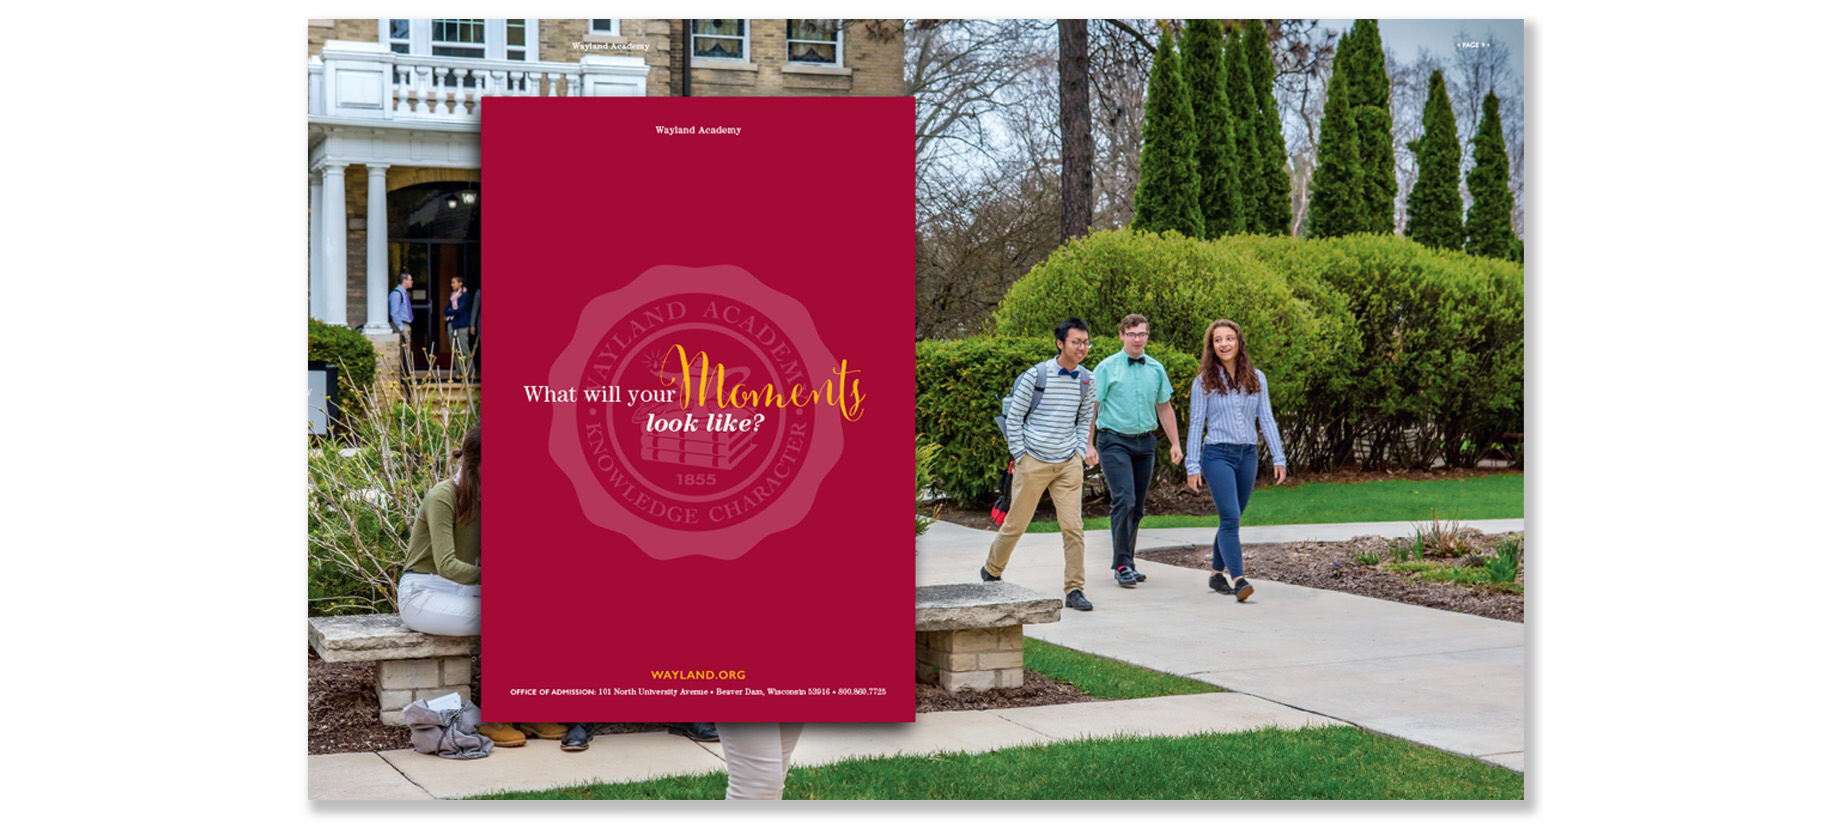 wayland-academy-viewbook-kelsh-wilson-5b.jpg